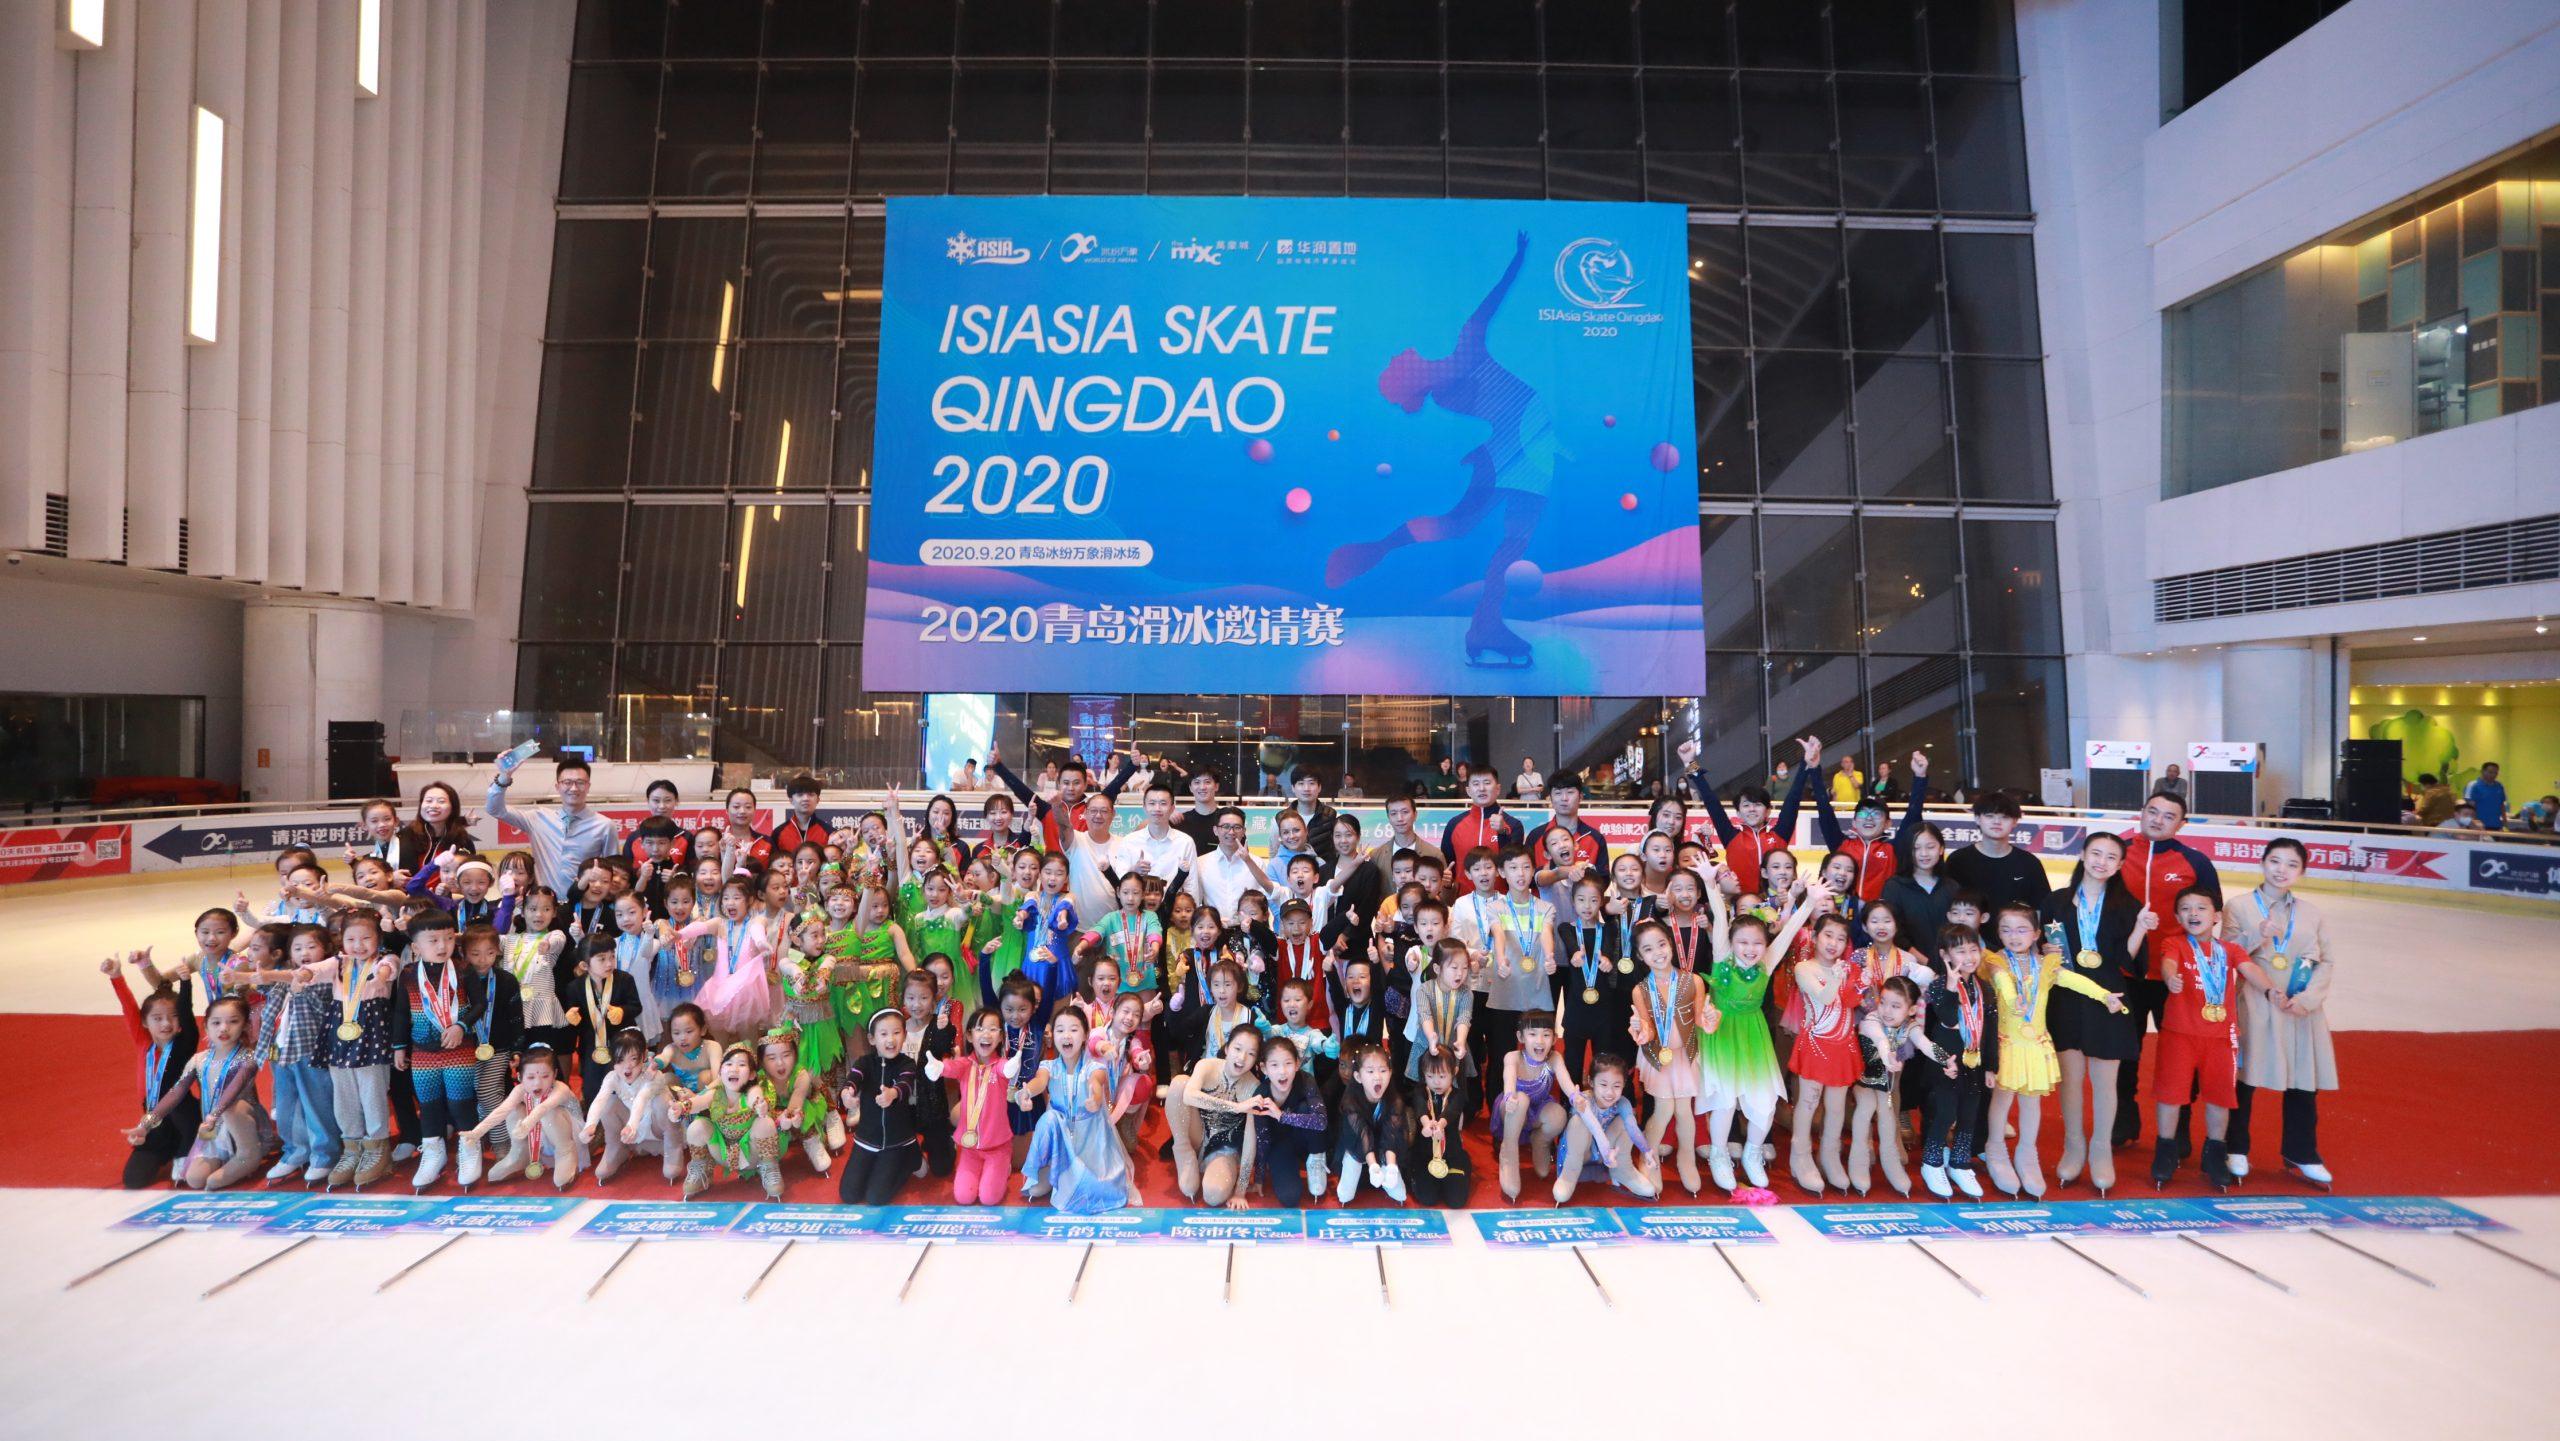 ISIAsia Skate Qingdao 2020